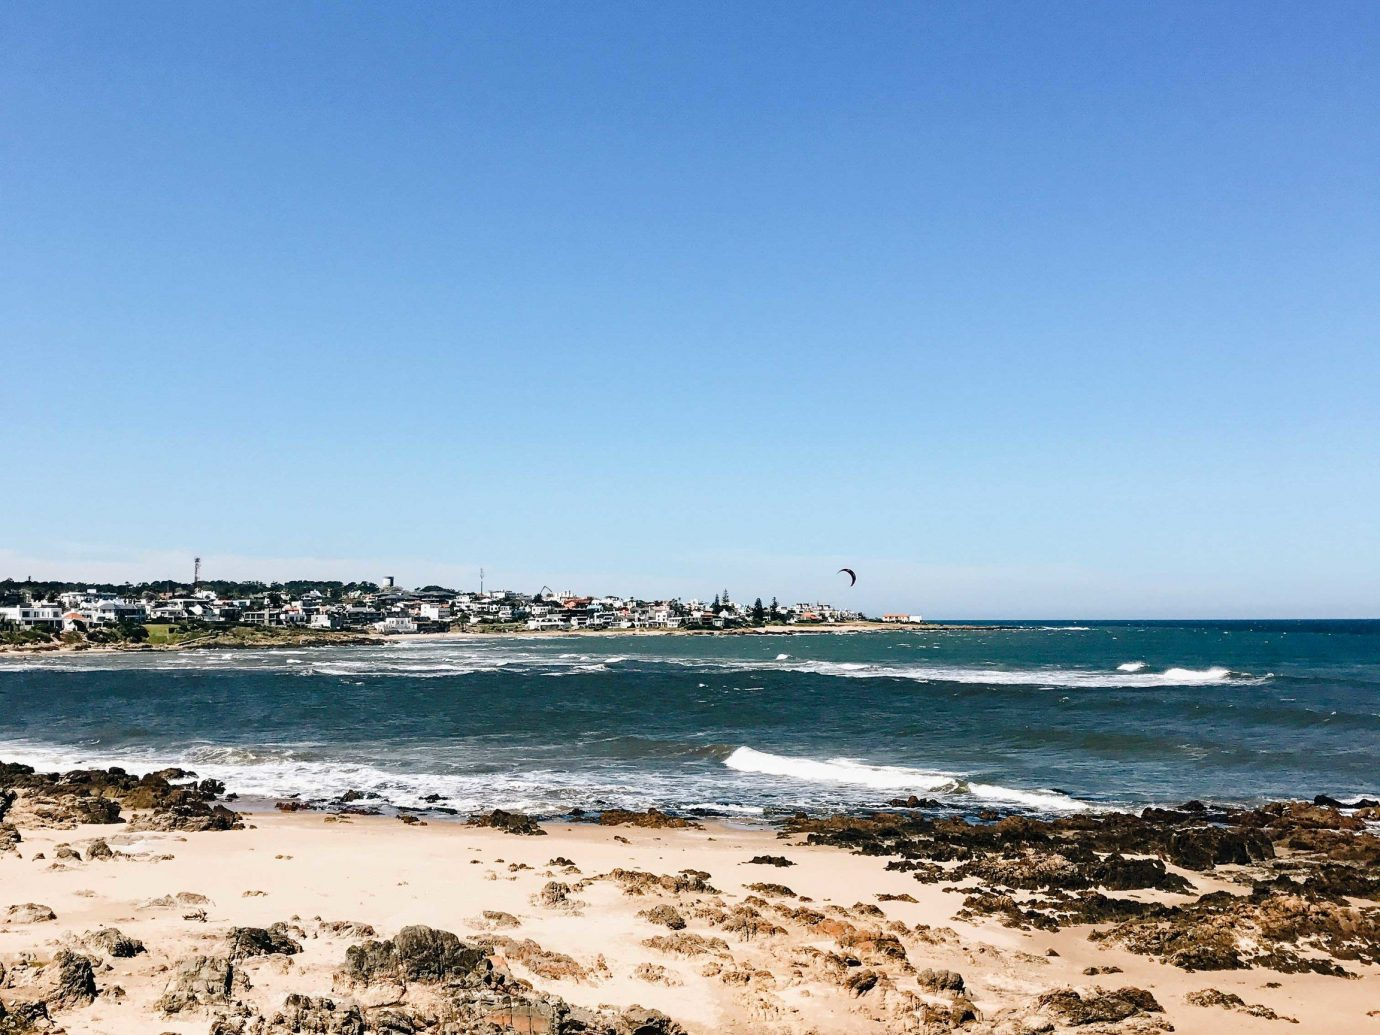 Romantic Getaways south america Trip Ideas Uruguay Sea Coast sky Beach shore coastal and oceanic landforms body of water Ocean horizon bay headland sand water promontory cape wave inlet calm wind wave tide